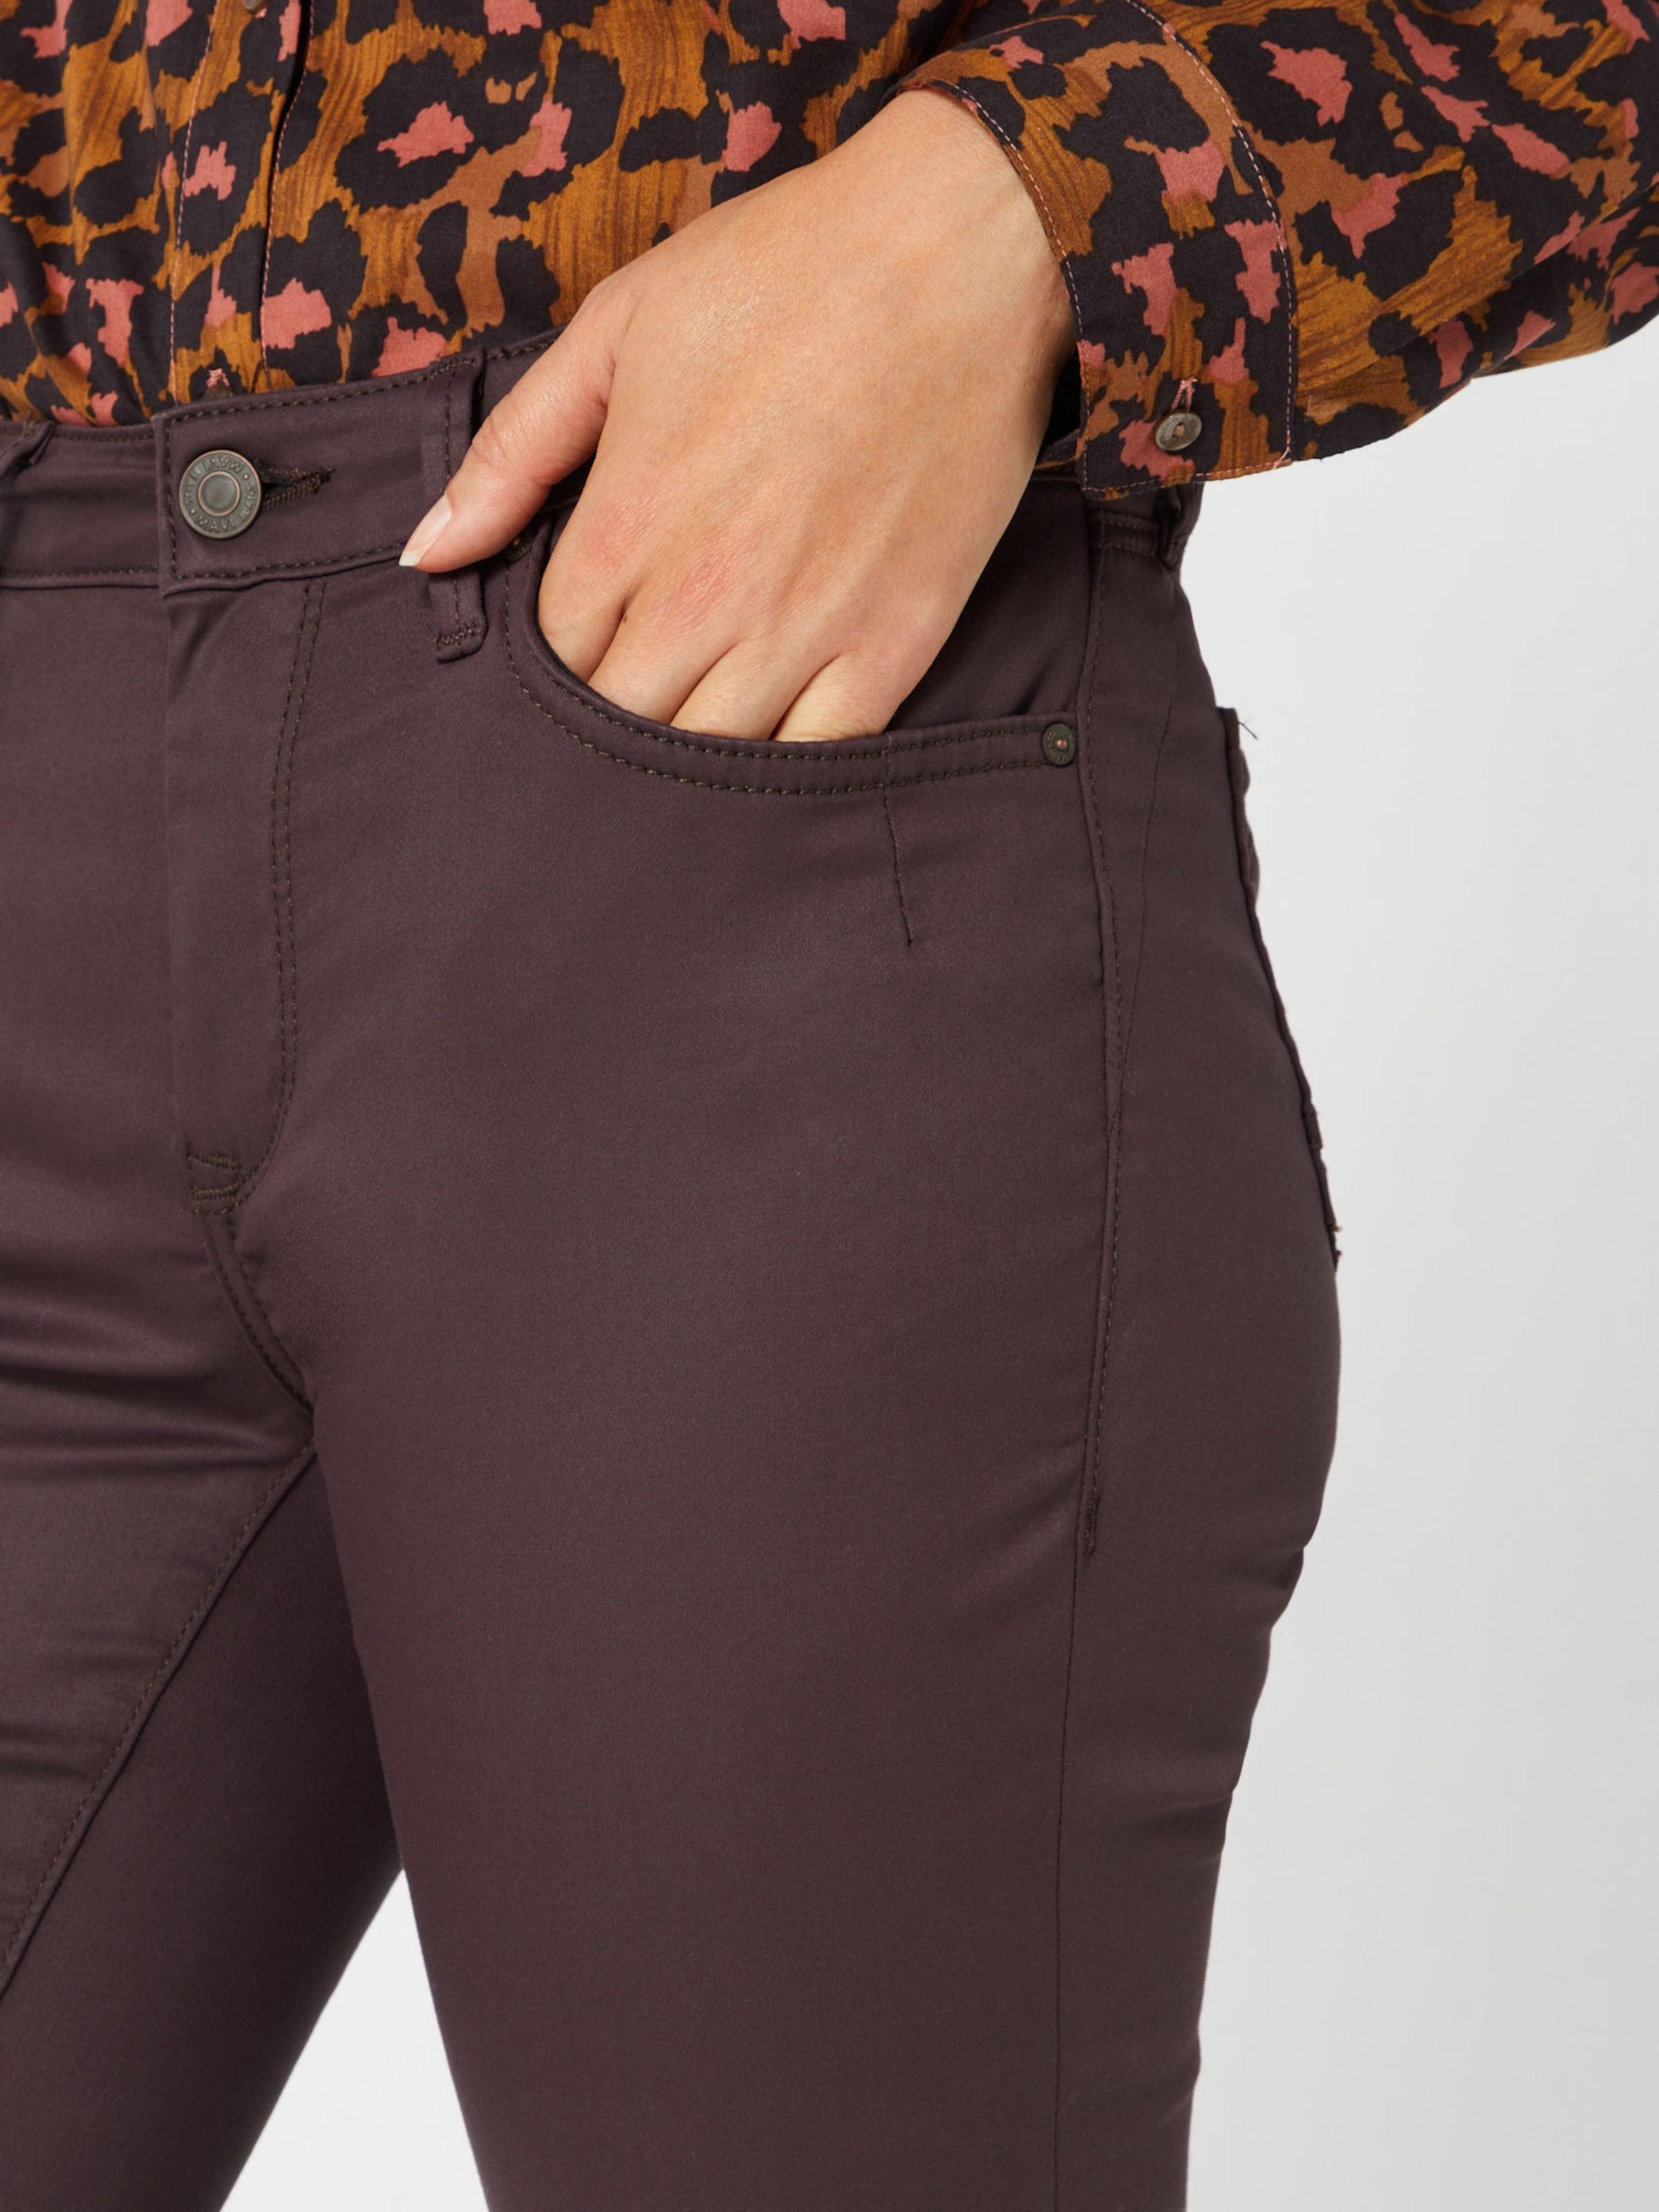 En Mavi Pantalon Bordeaux Mavi Pantalon En Pantalon Mavi Bordeaux qVzMpSUG